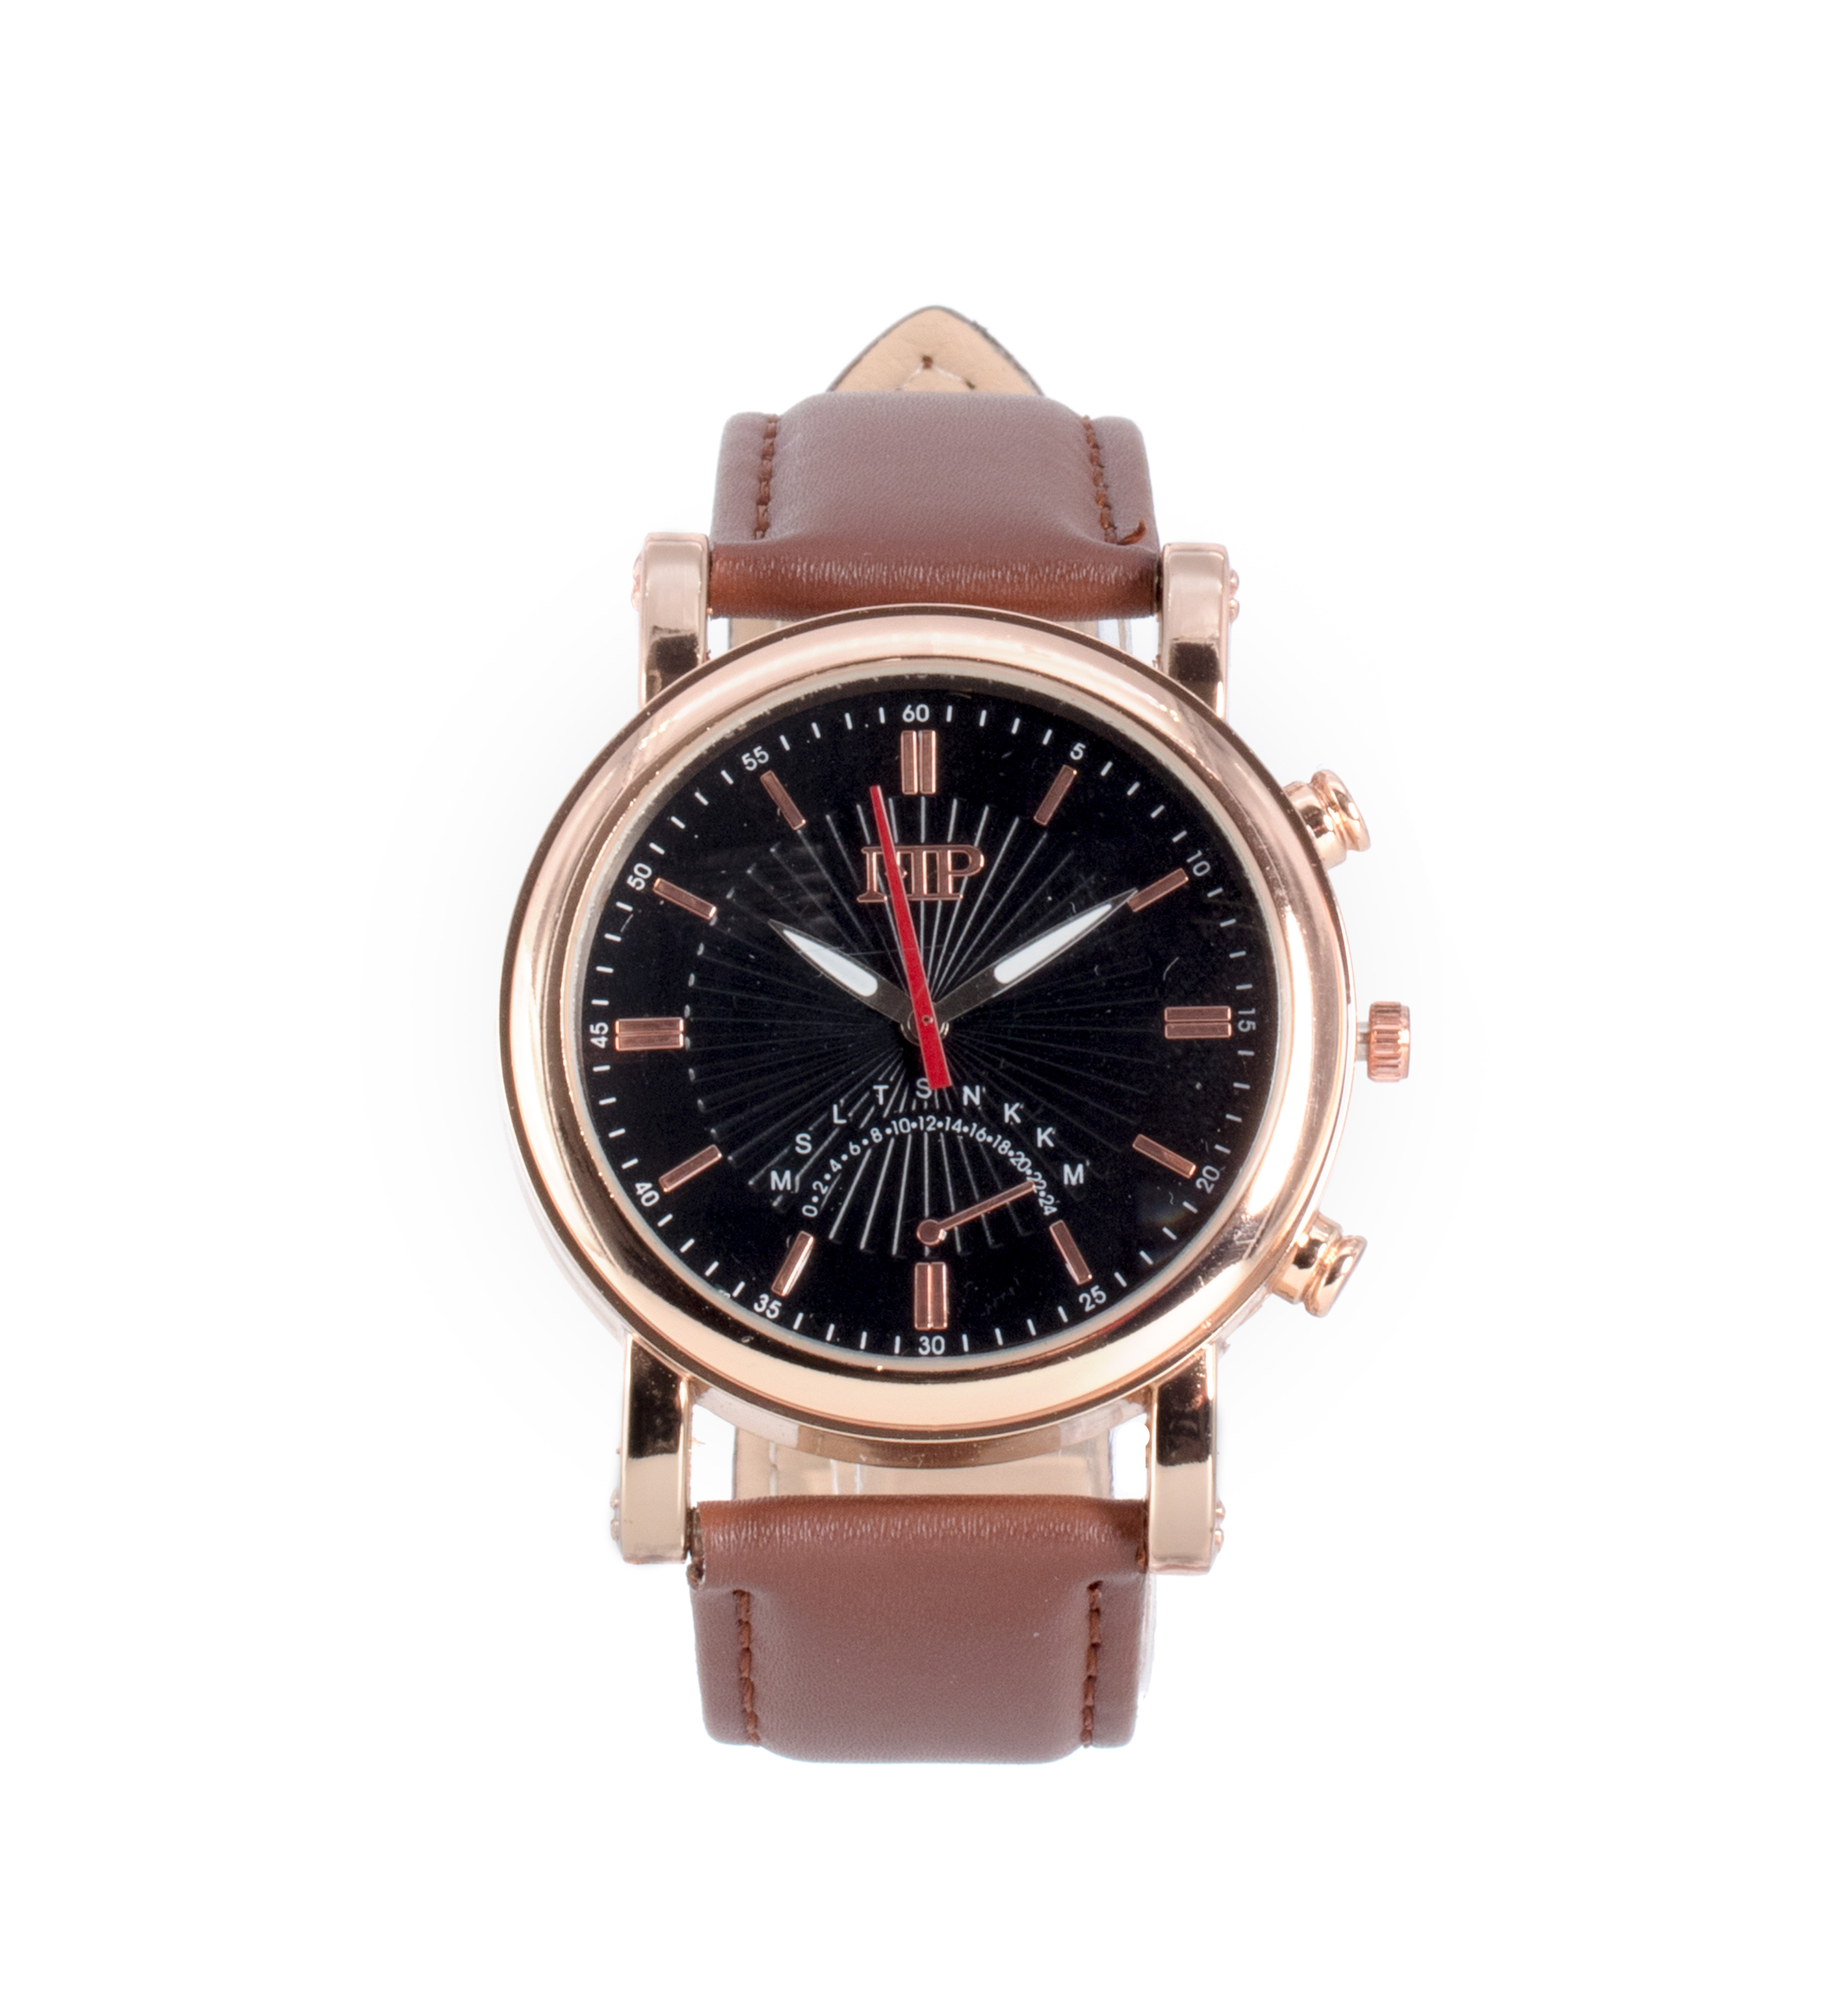 Comprar Marsan Piel Relógio analógico Flitwick castanho, preto